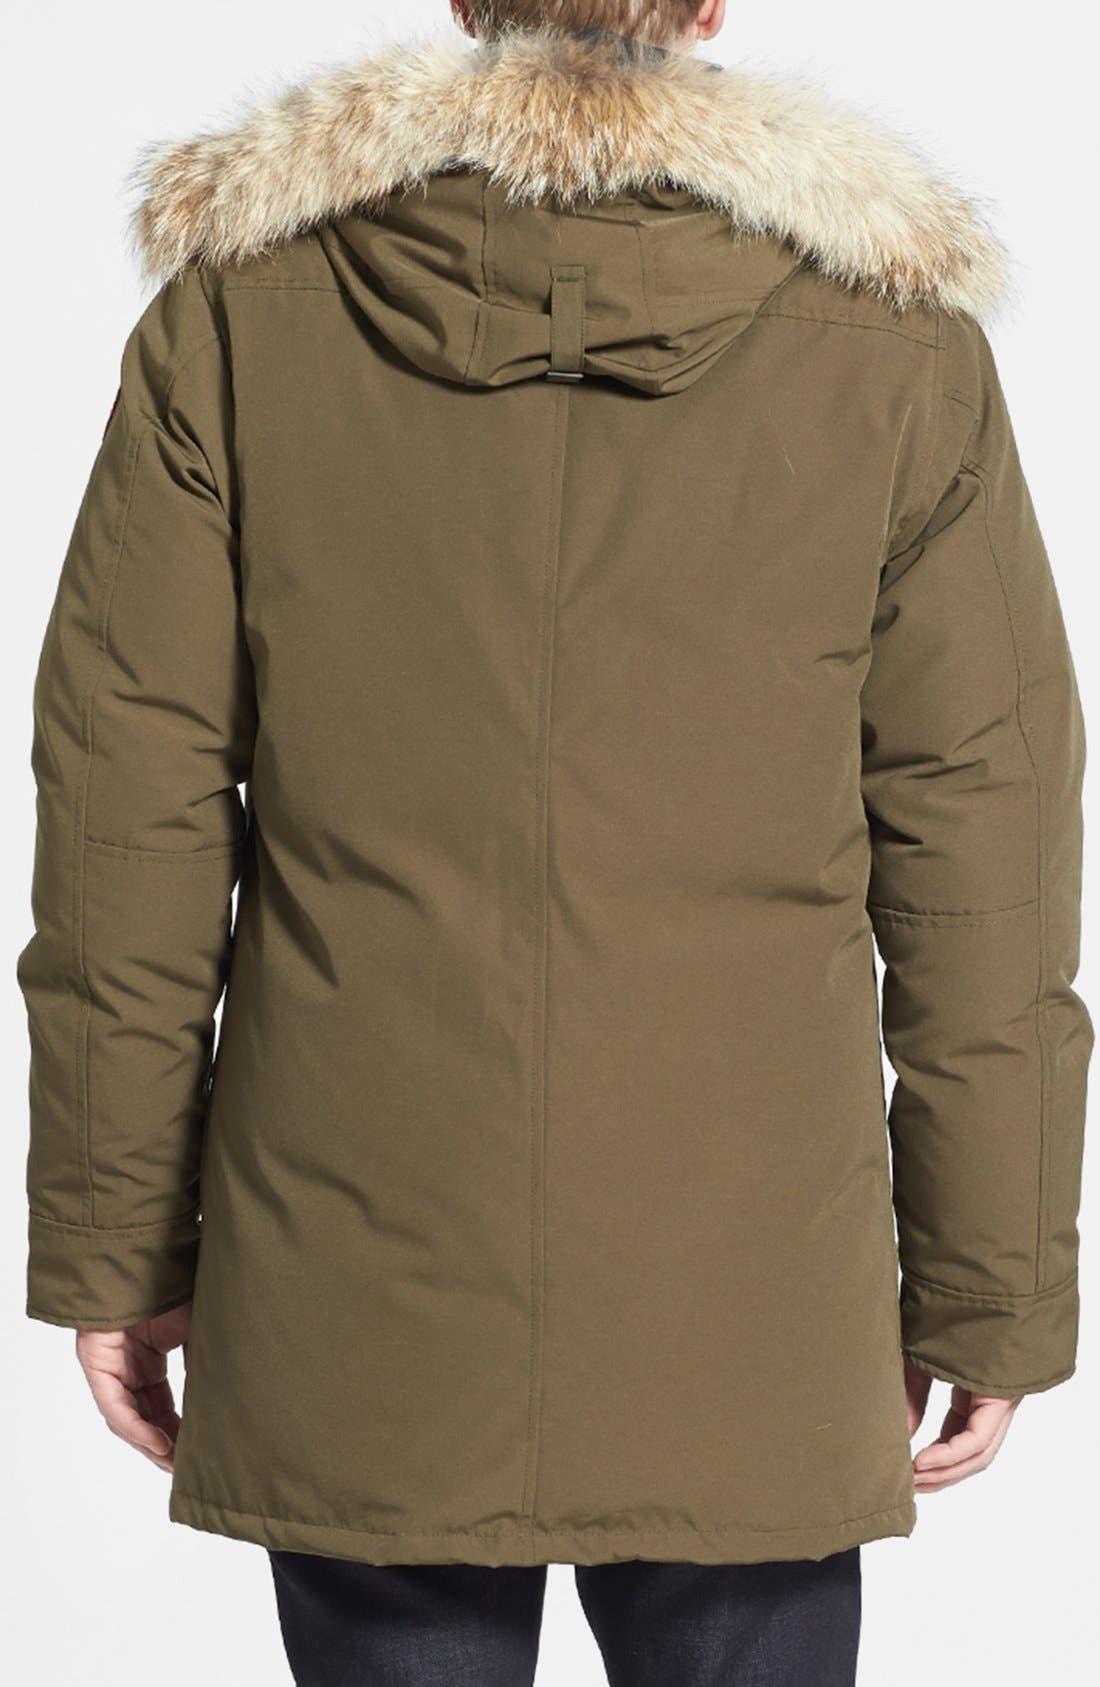 'Chateau' Slim Fit Genuine Coyote Fur Trim Jacket,                             Alternate thumbnail 2, color,                             Military Green